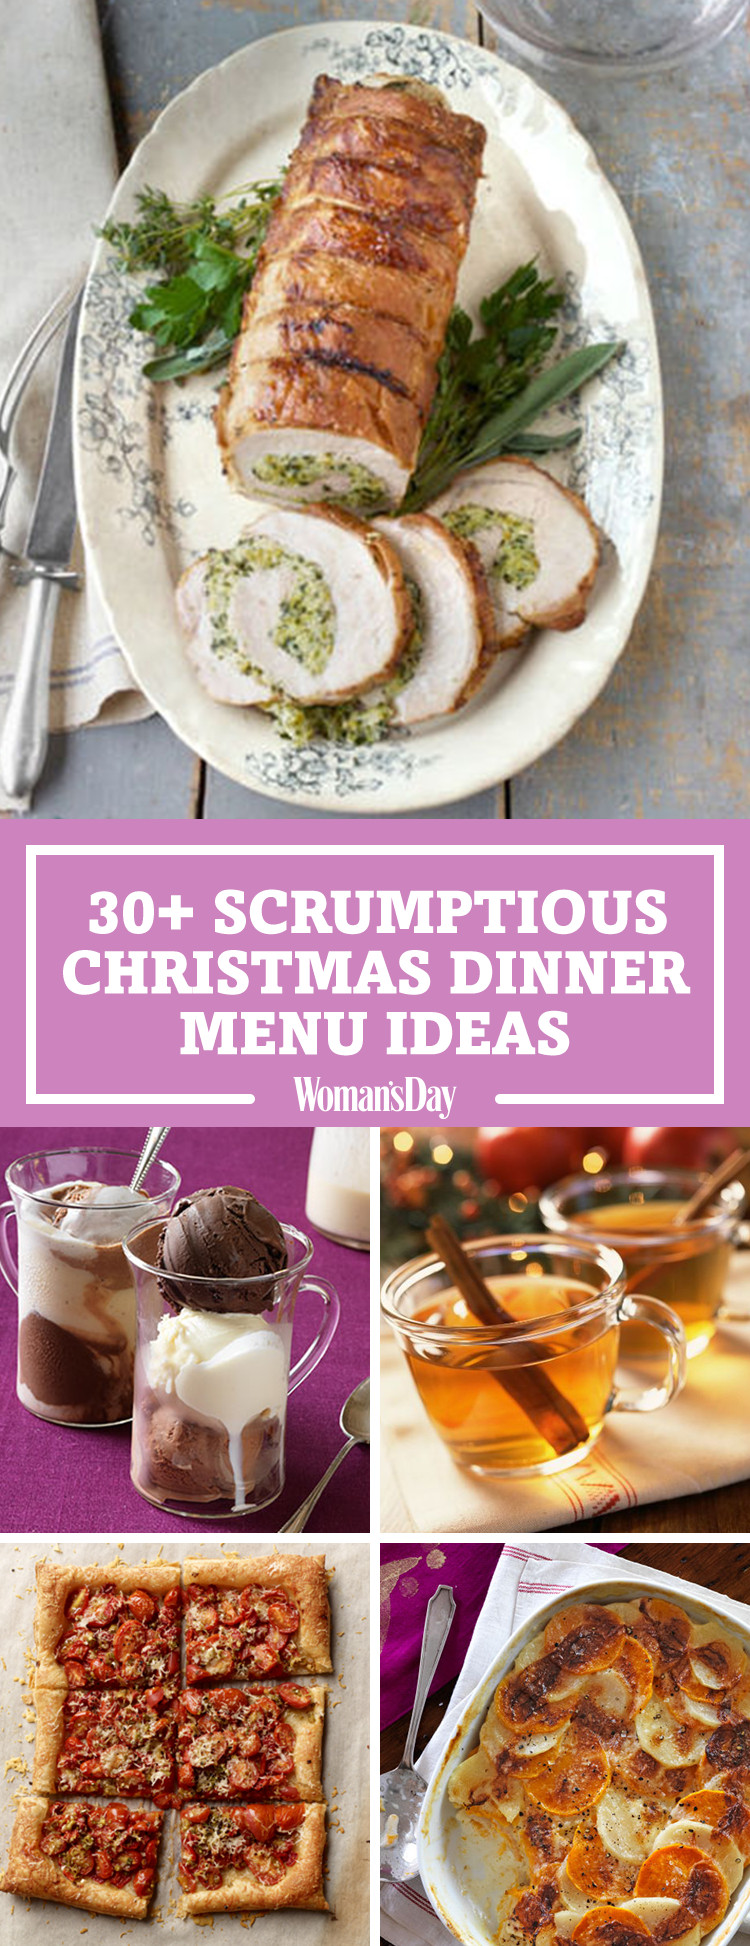 Best Christmas Dinner Recipes  Best Christmas Dinner Menu Ideas for 2017